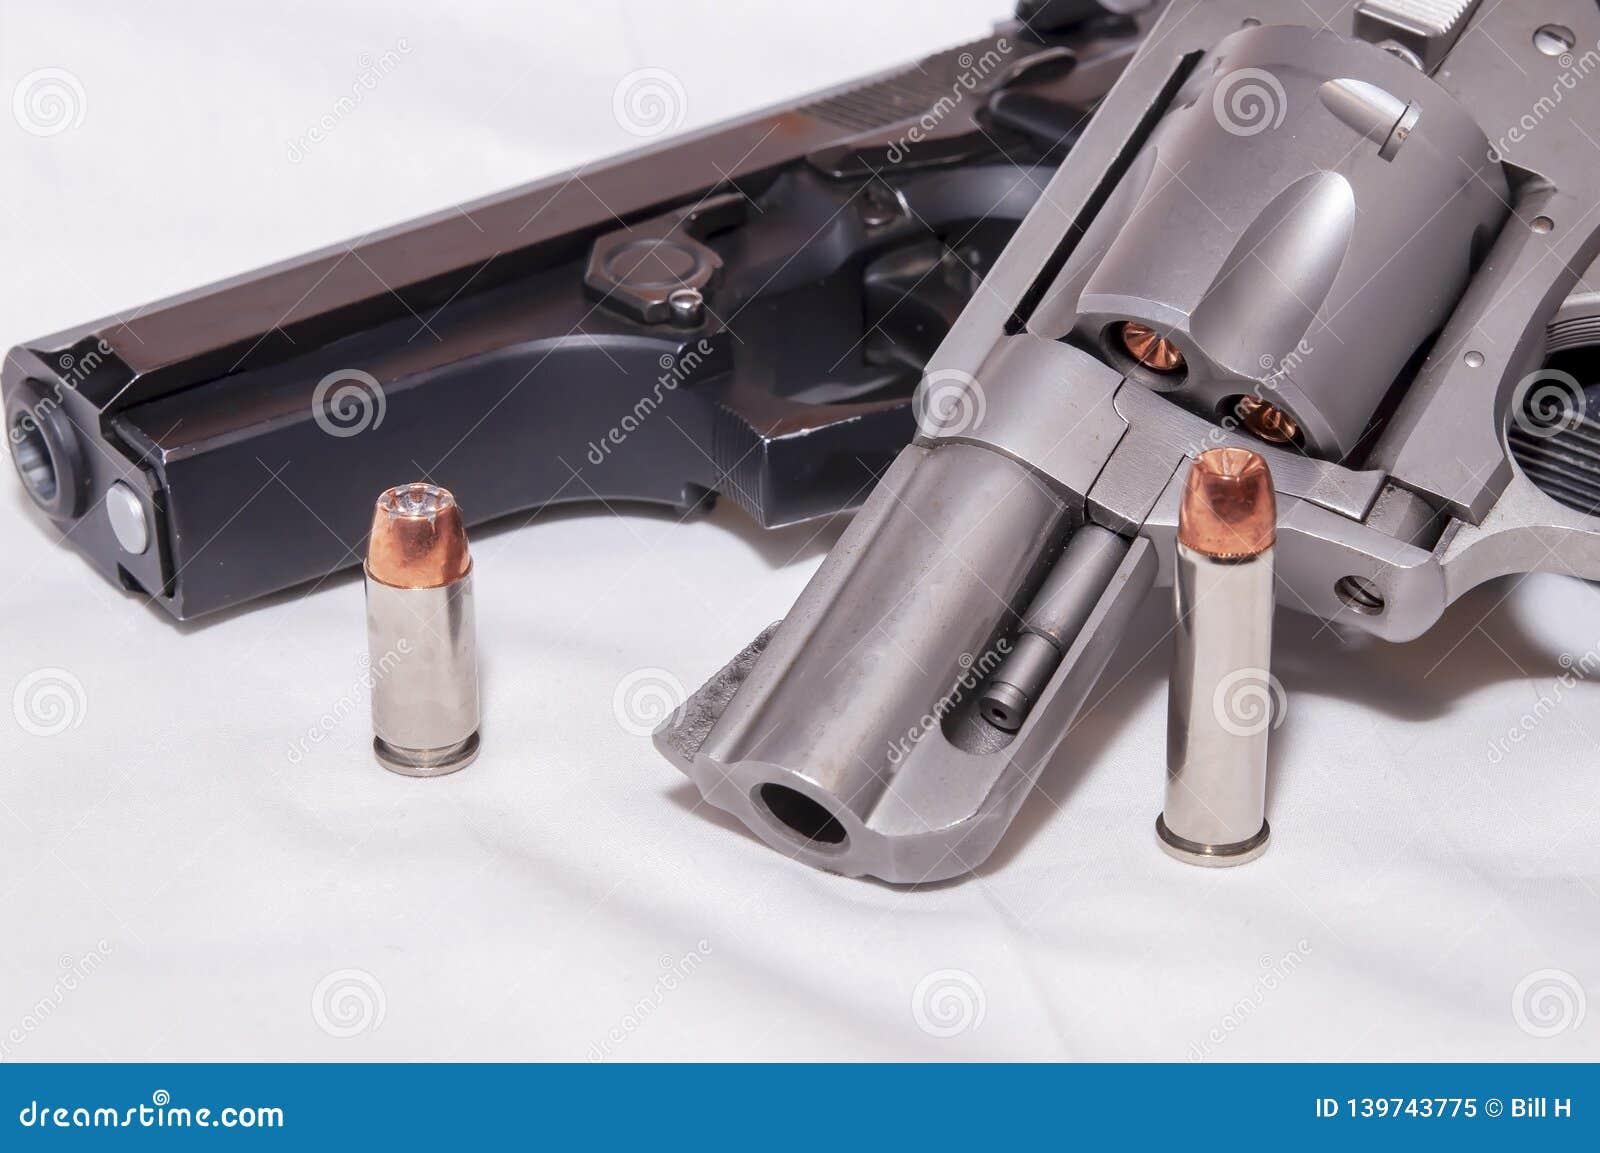 Two Handguns, A 357 Magnum Revolver And A Black 40 Caliber Pistol